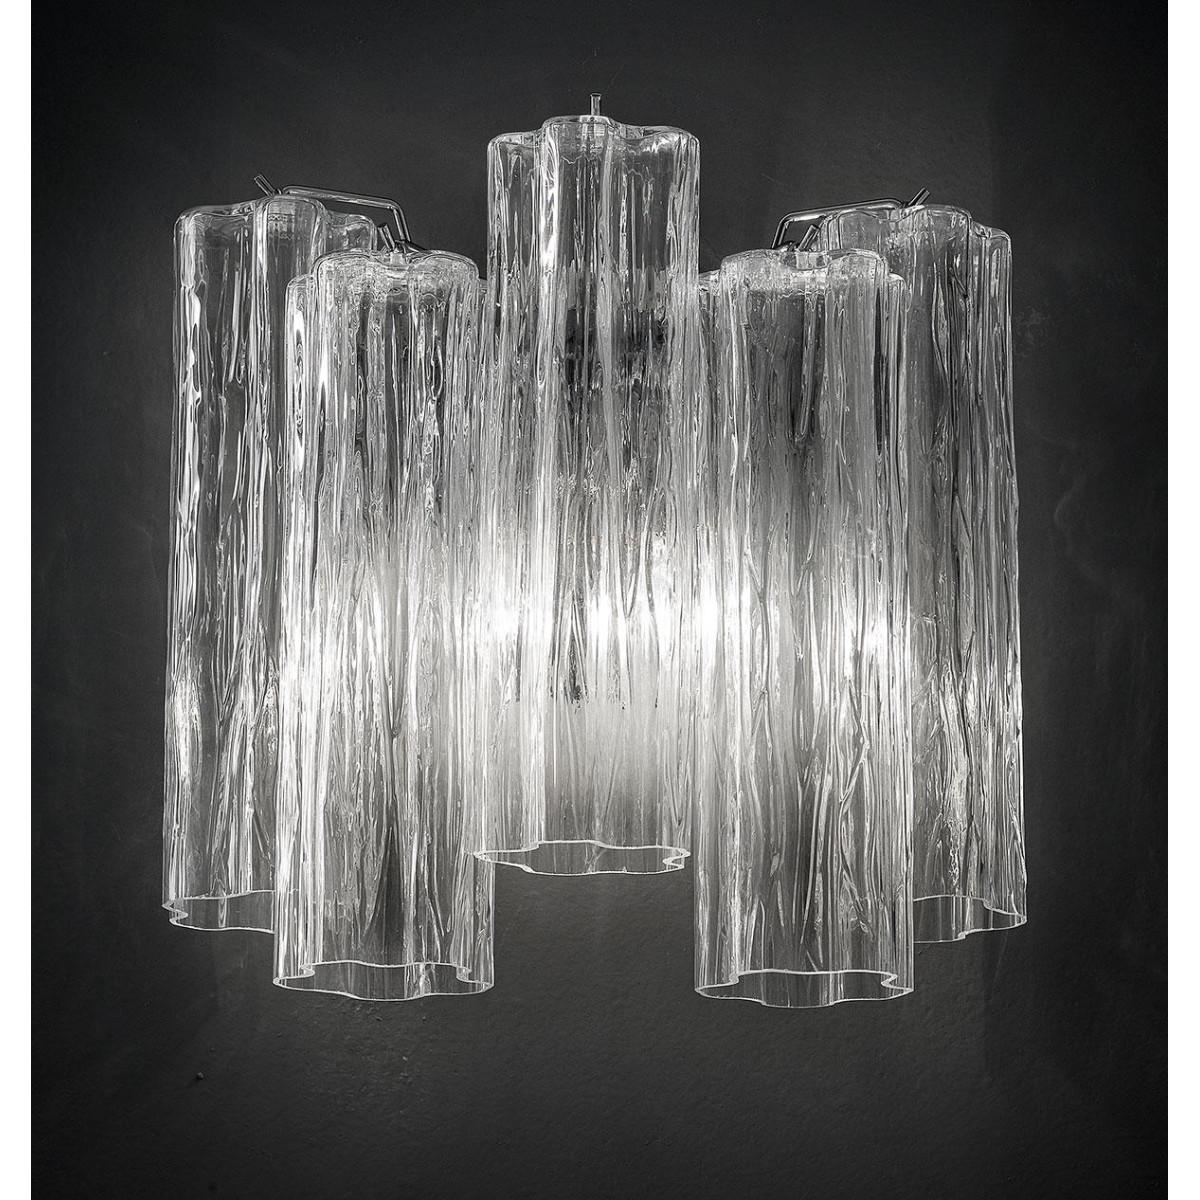 """Holly"" aplique de pared de Murano - 2 luces - transparente y cromo"